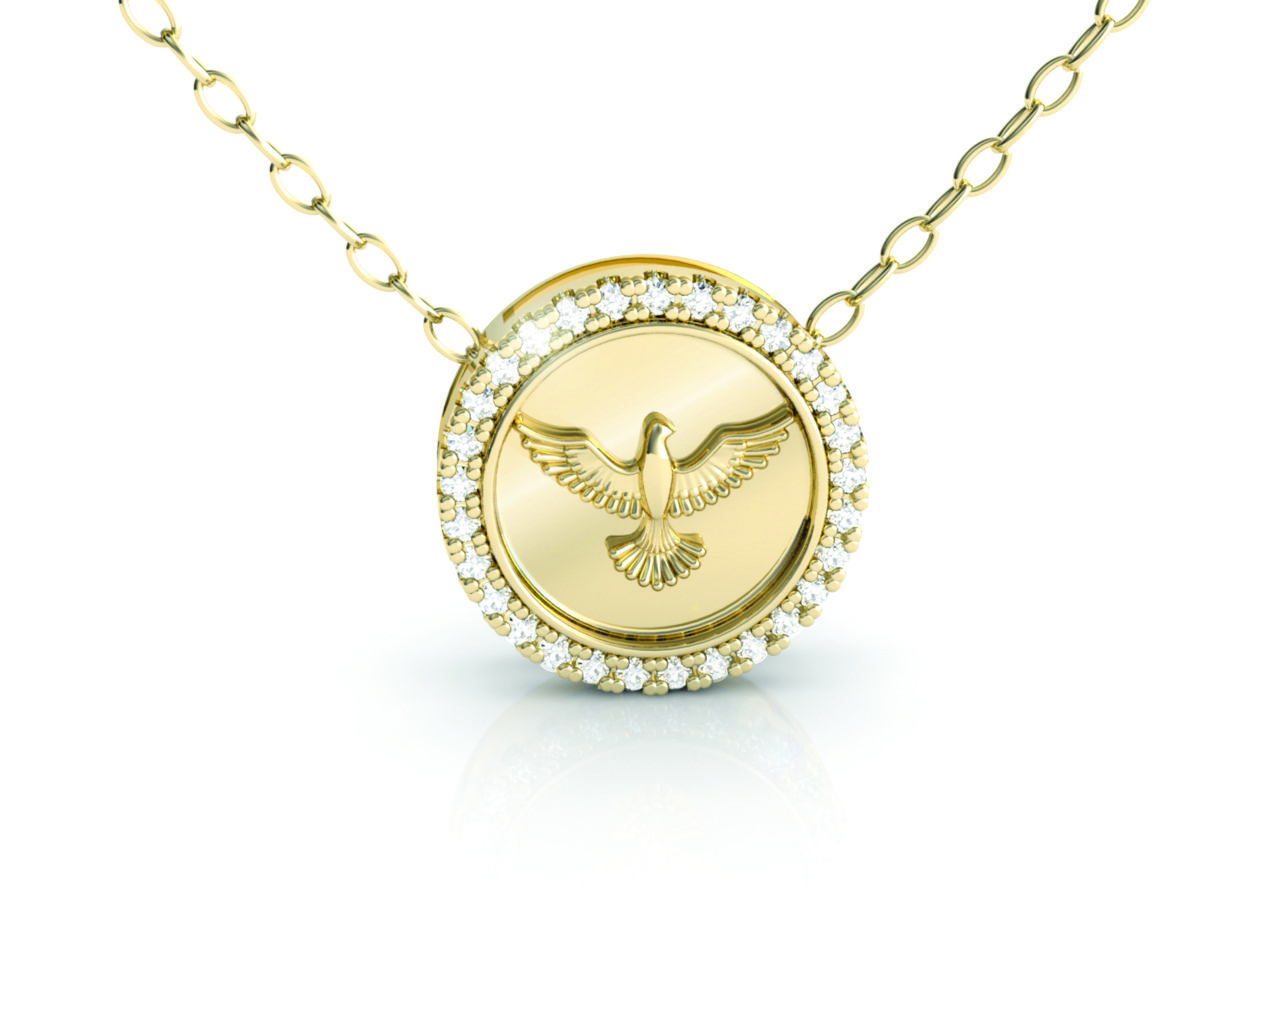 Pingente Medalha Espirito Santo Ouro Amarelo